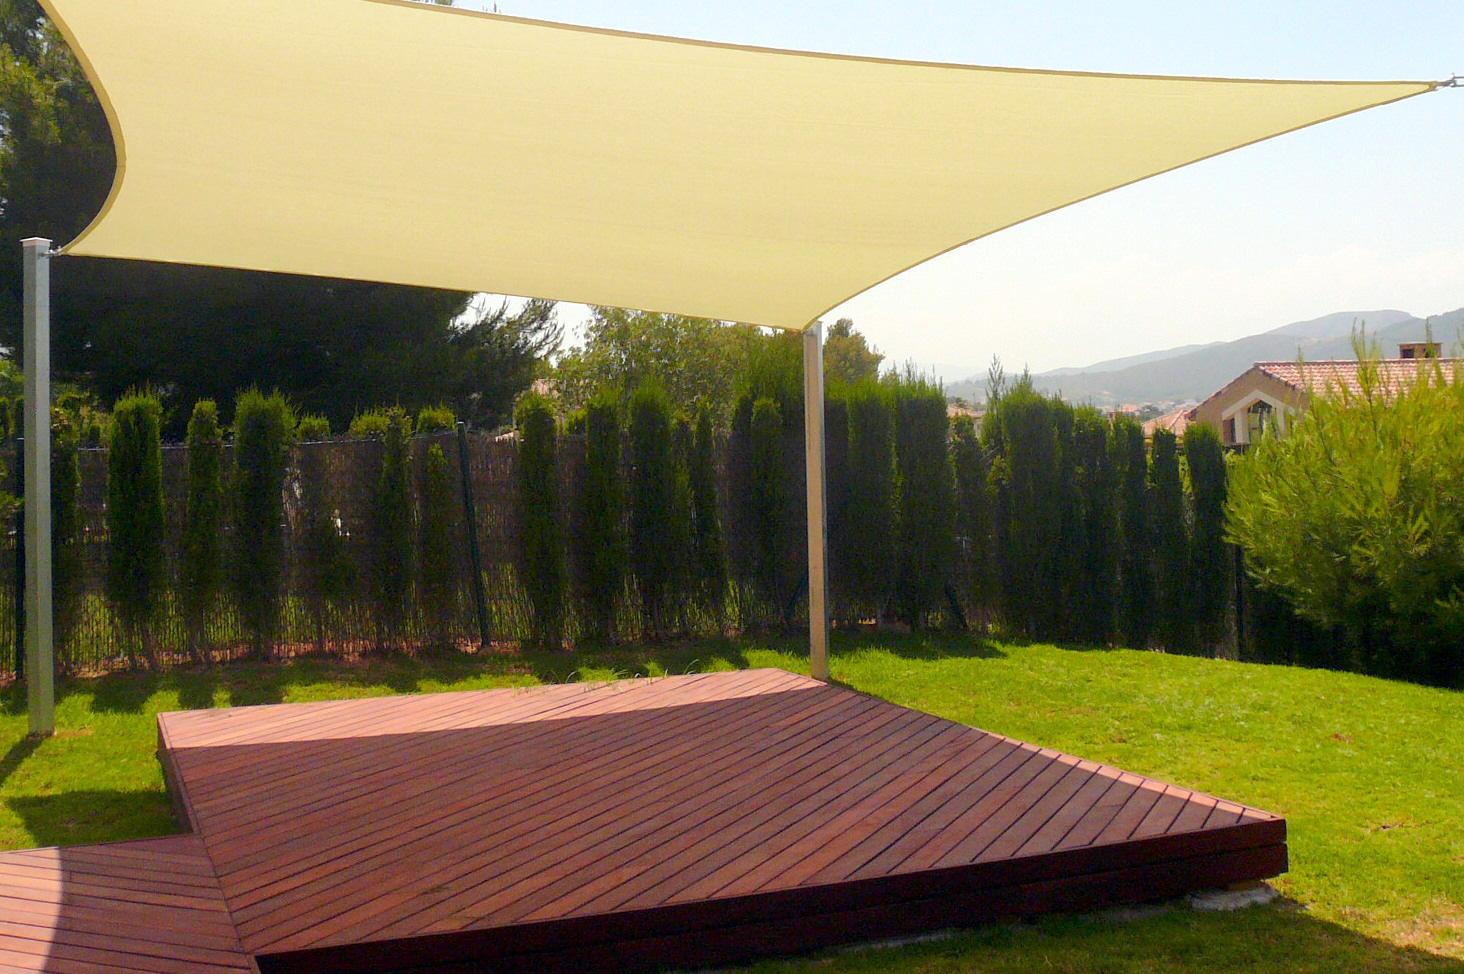 New Tan Sun Shade Sail Outdoor Square Canopy Cover Pool Patio 18 Feet  (18u0027x18u0027)